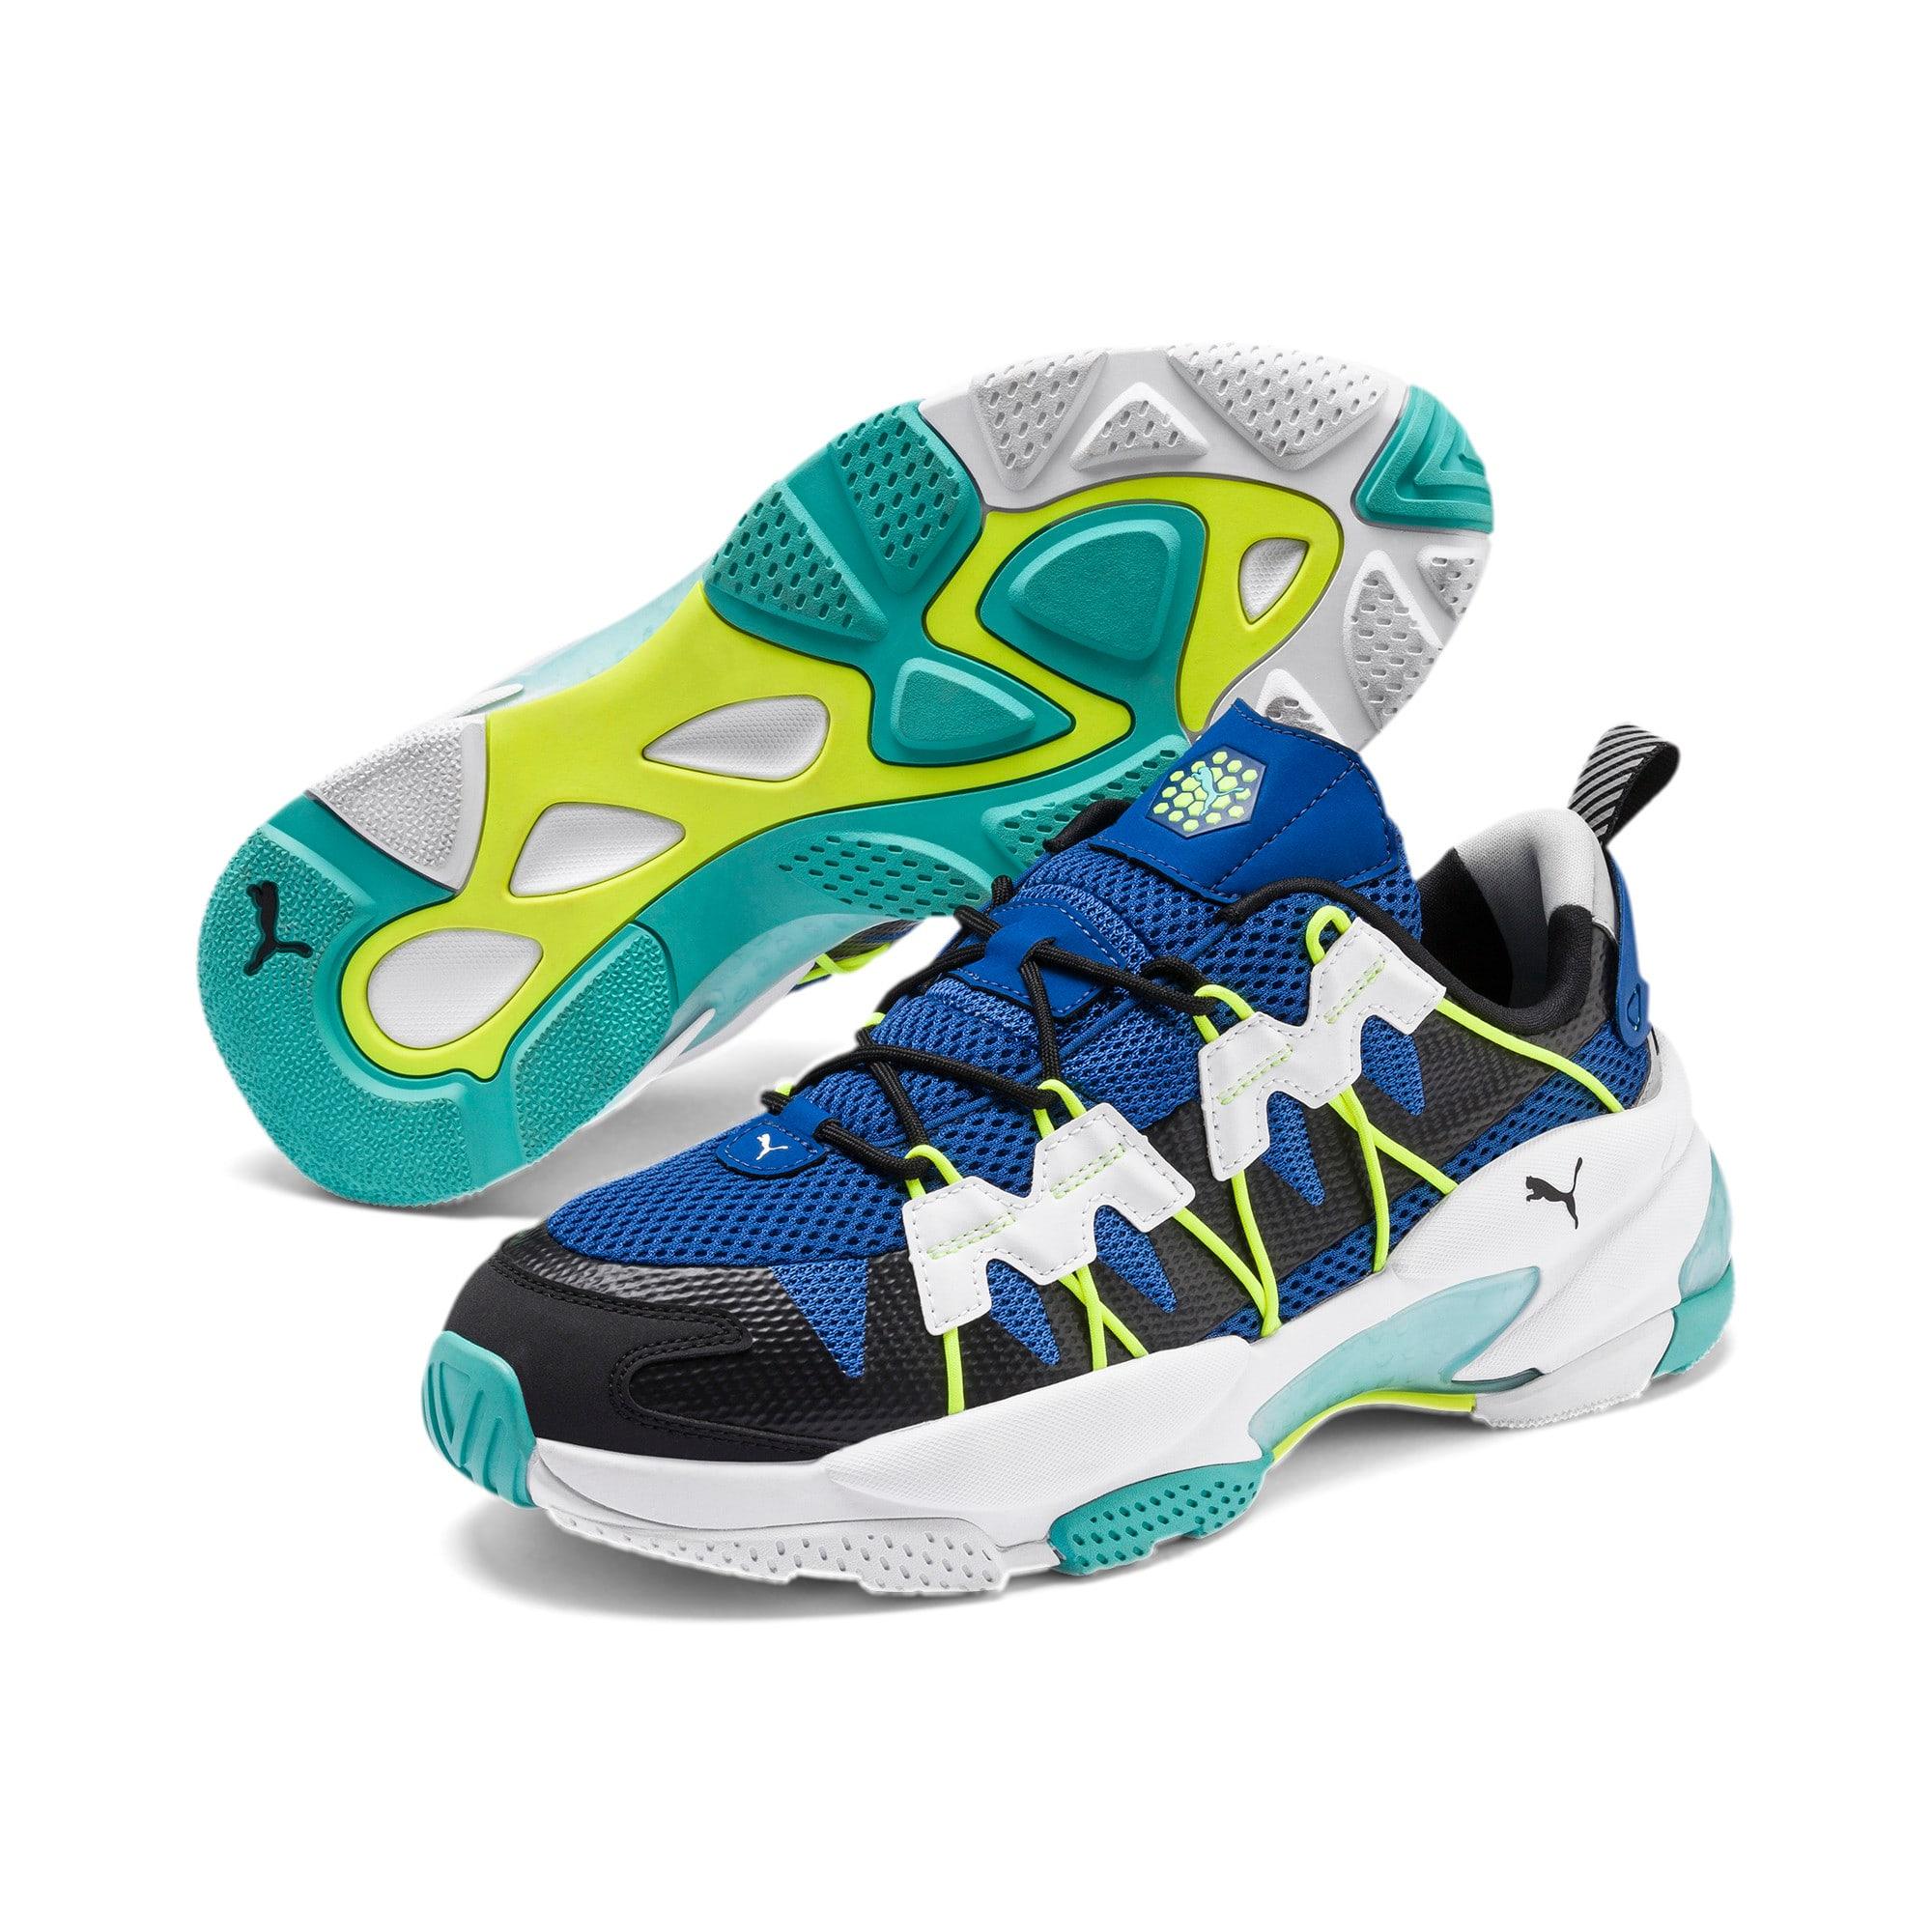 Thumbnail 2 of LQDCELL Omega Training Shoes, Puma Black-Galaxy Blue, medium